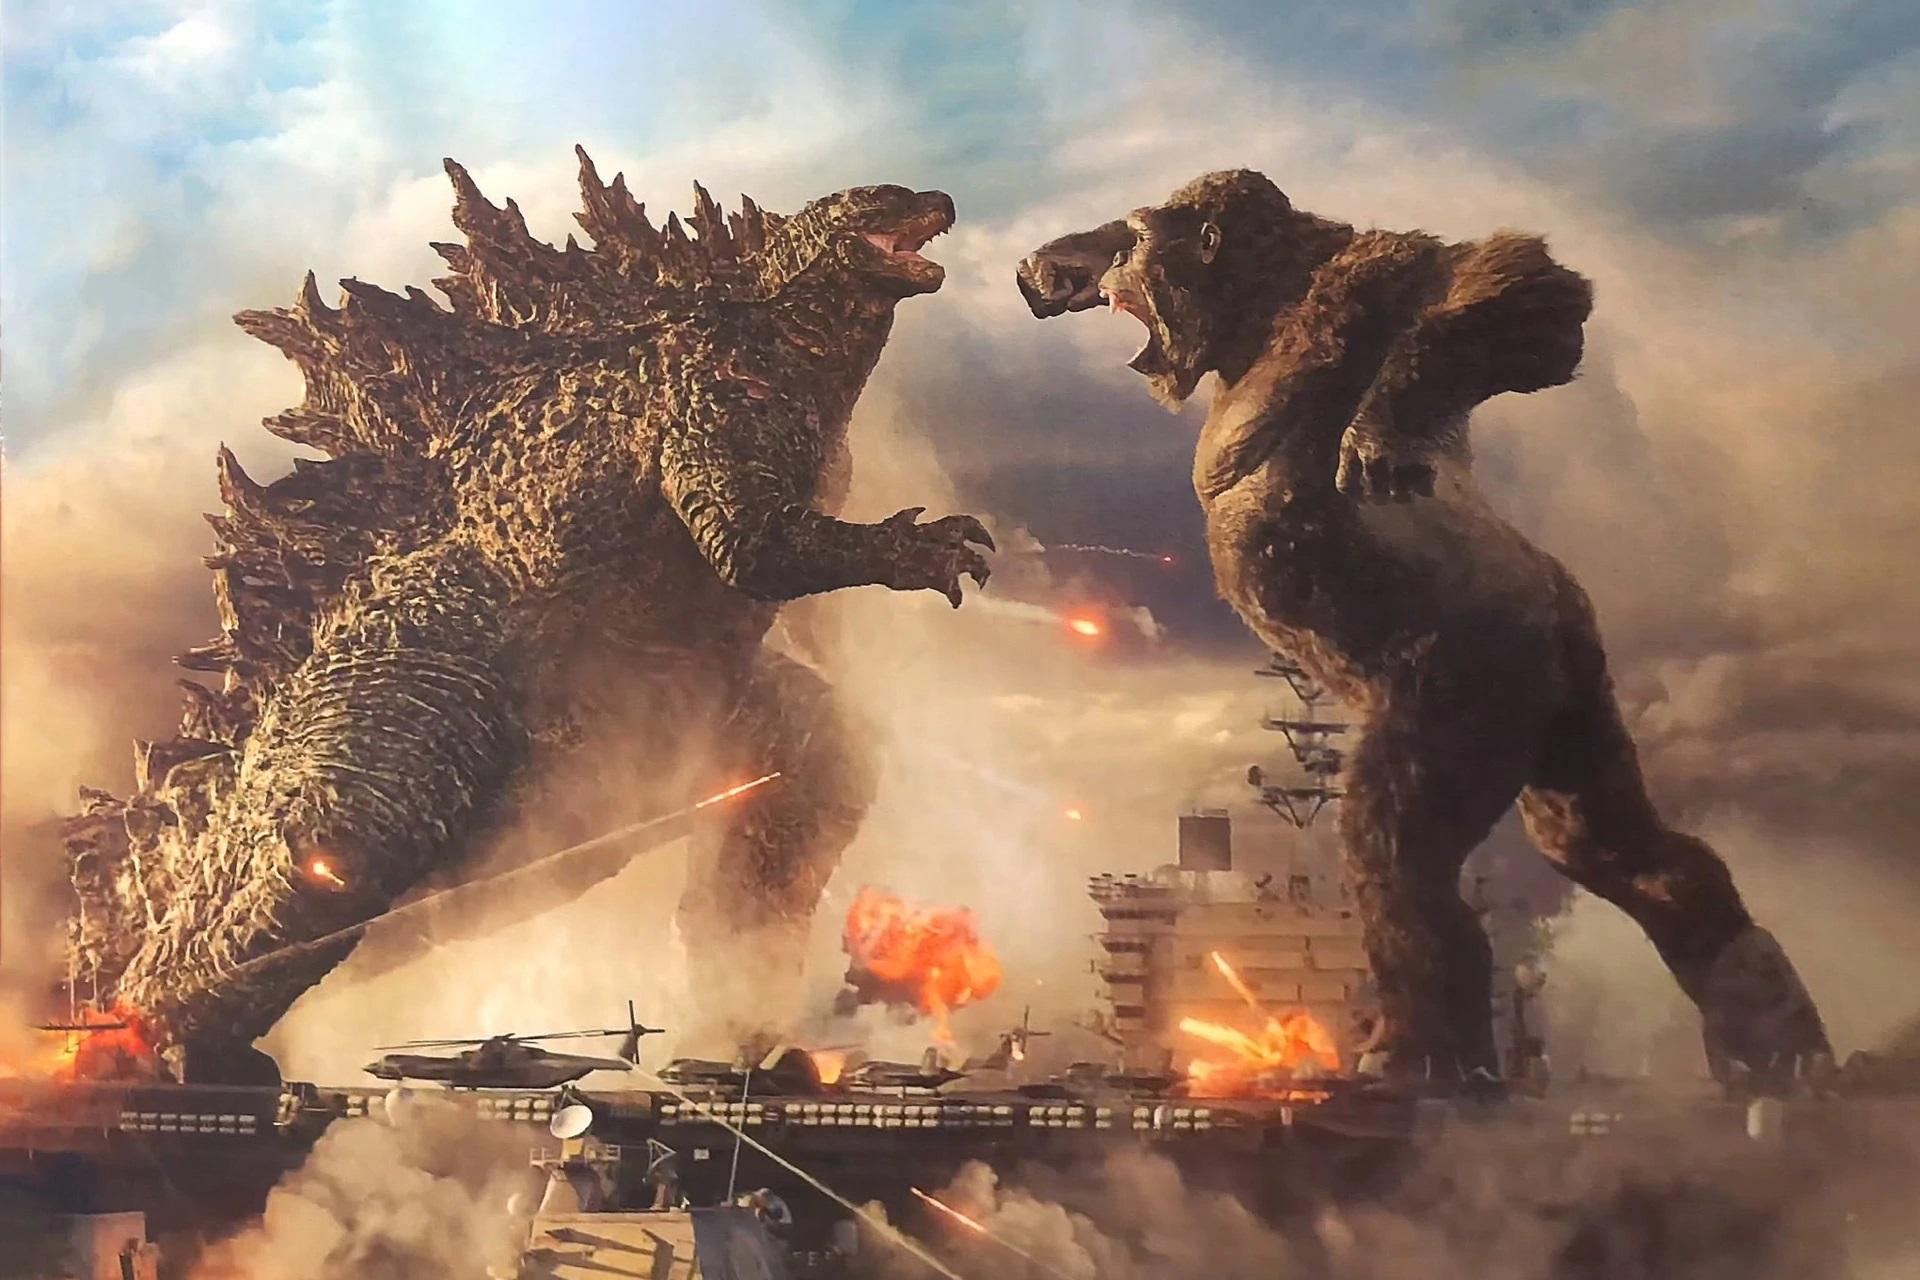 Godzilla vs Kong image film